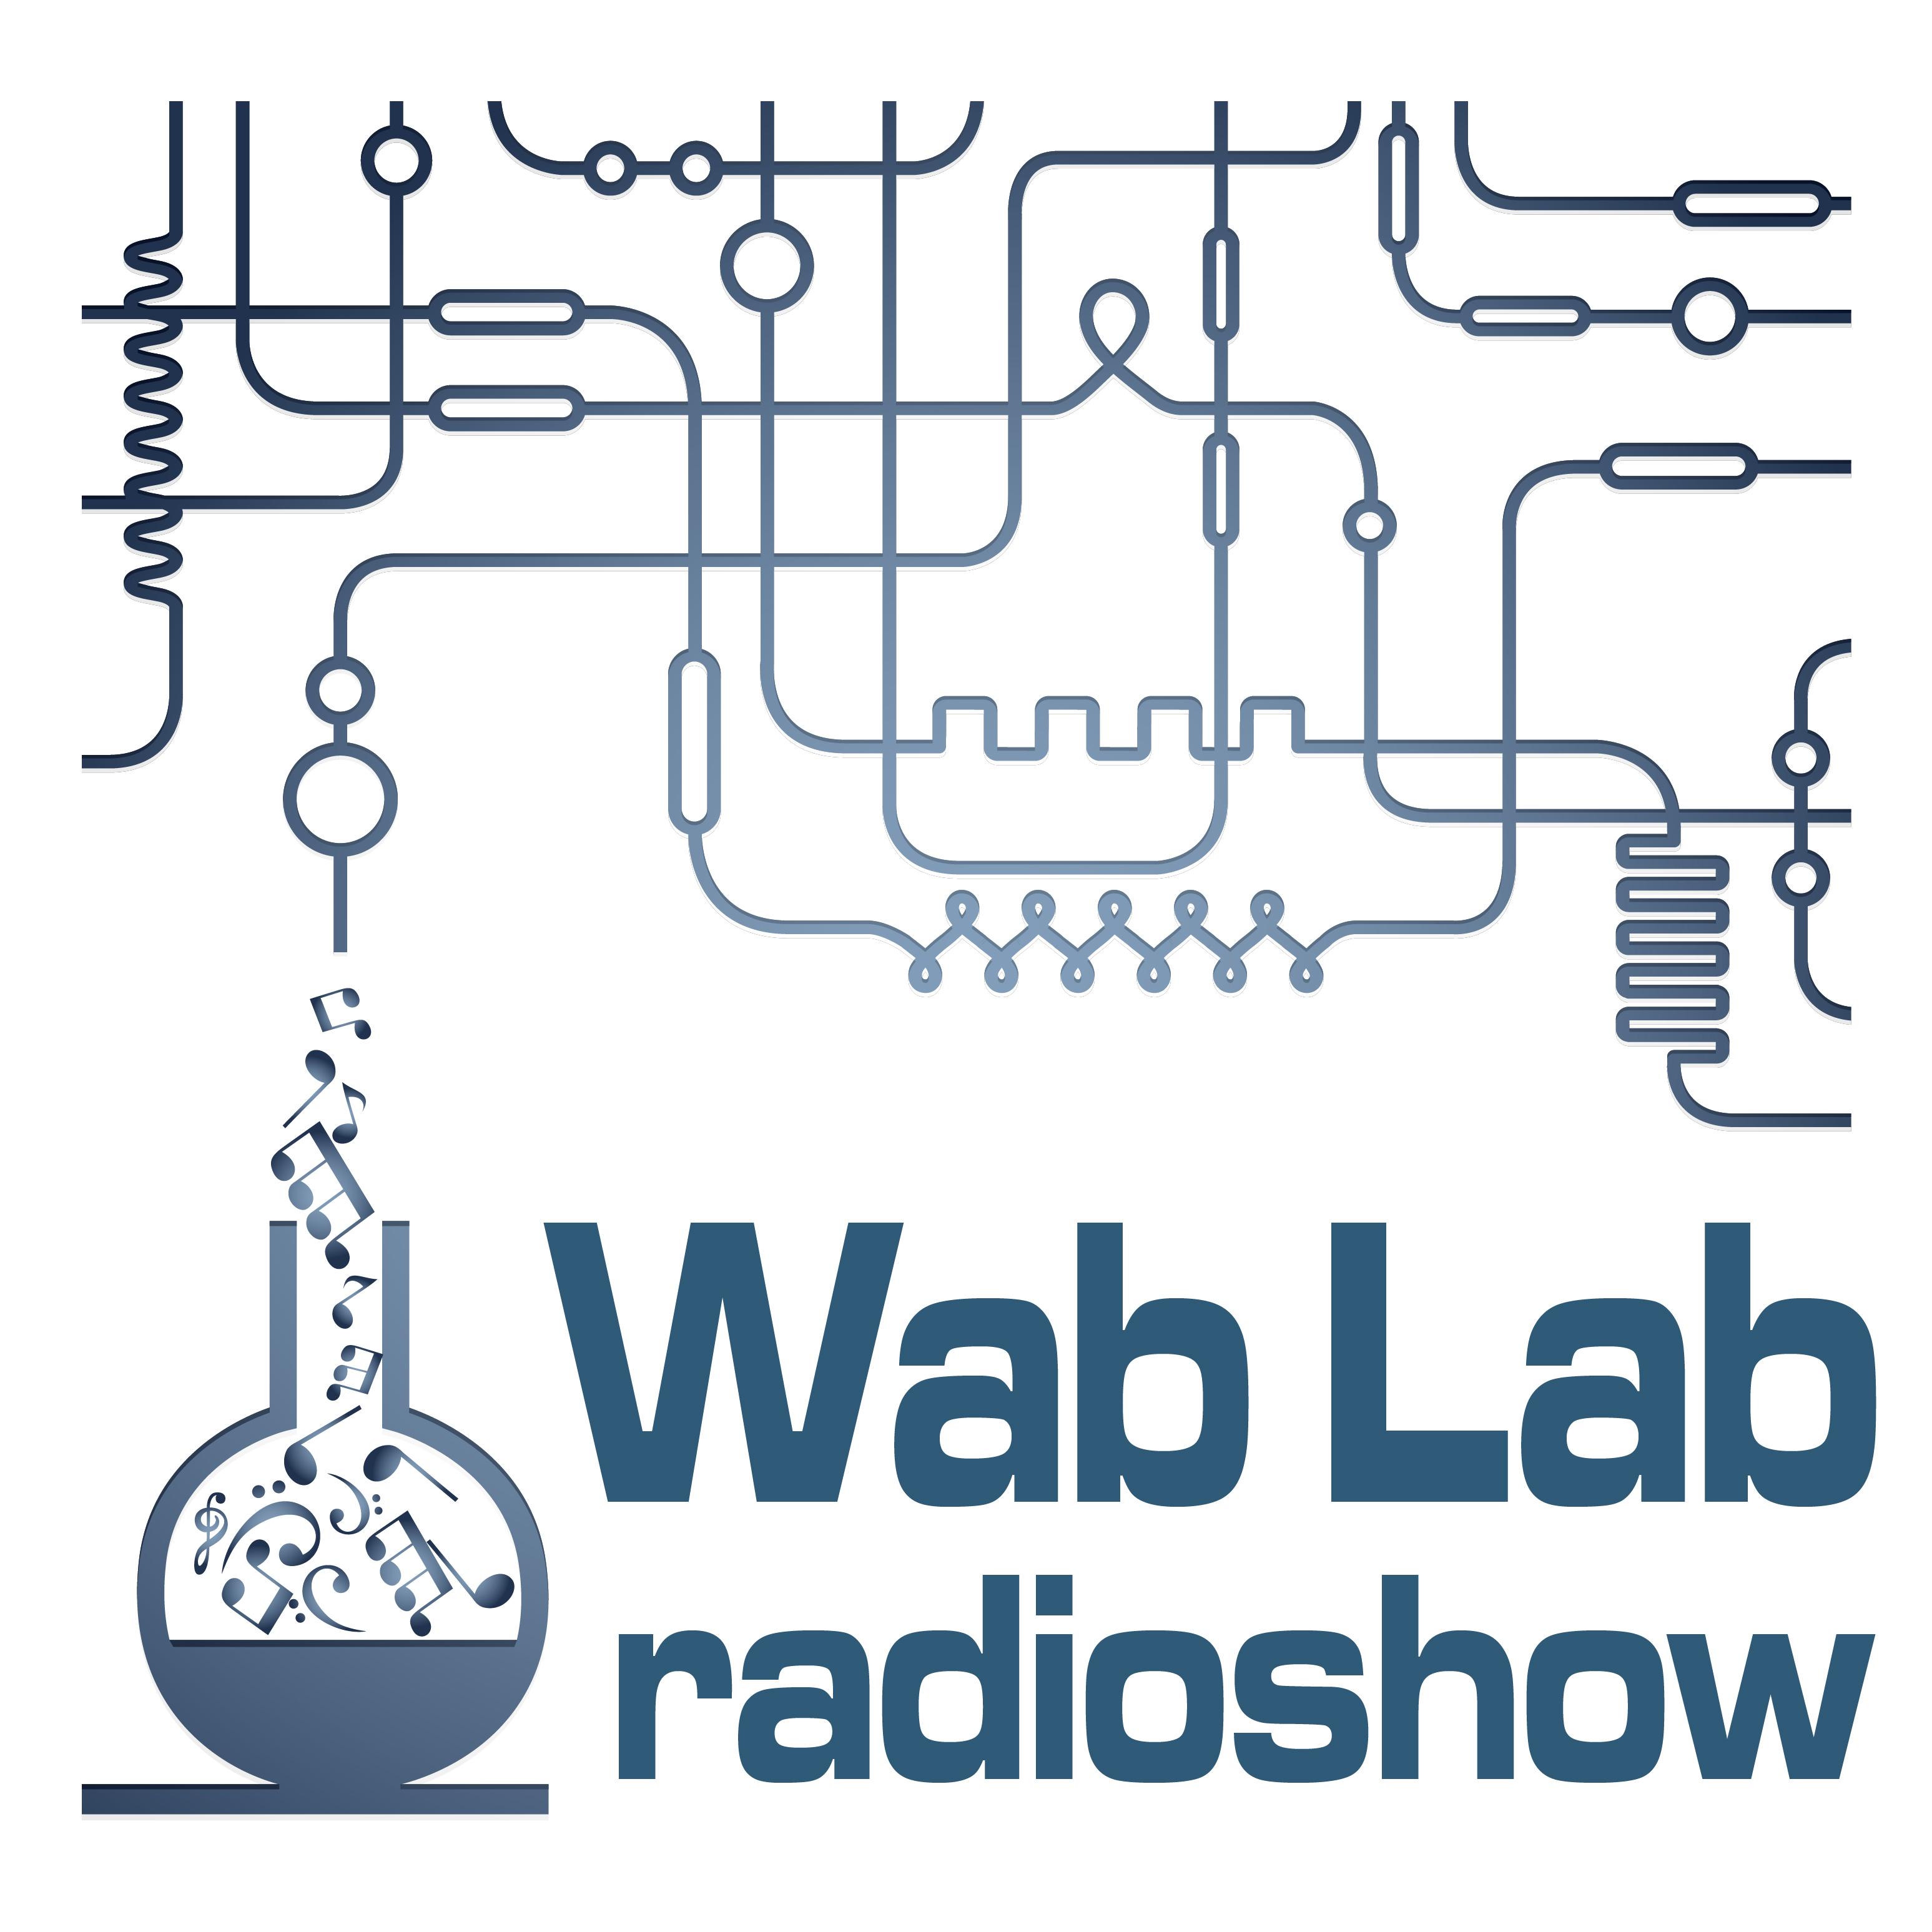 The Wab Lab